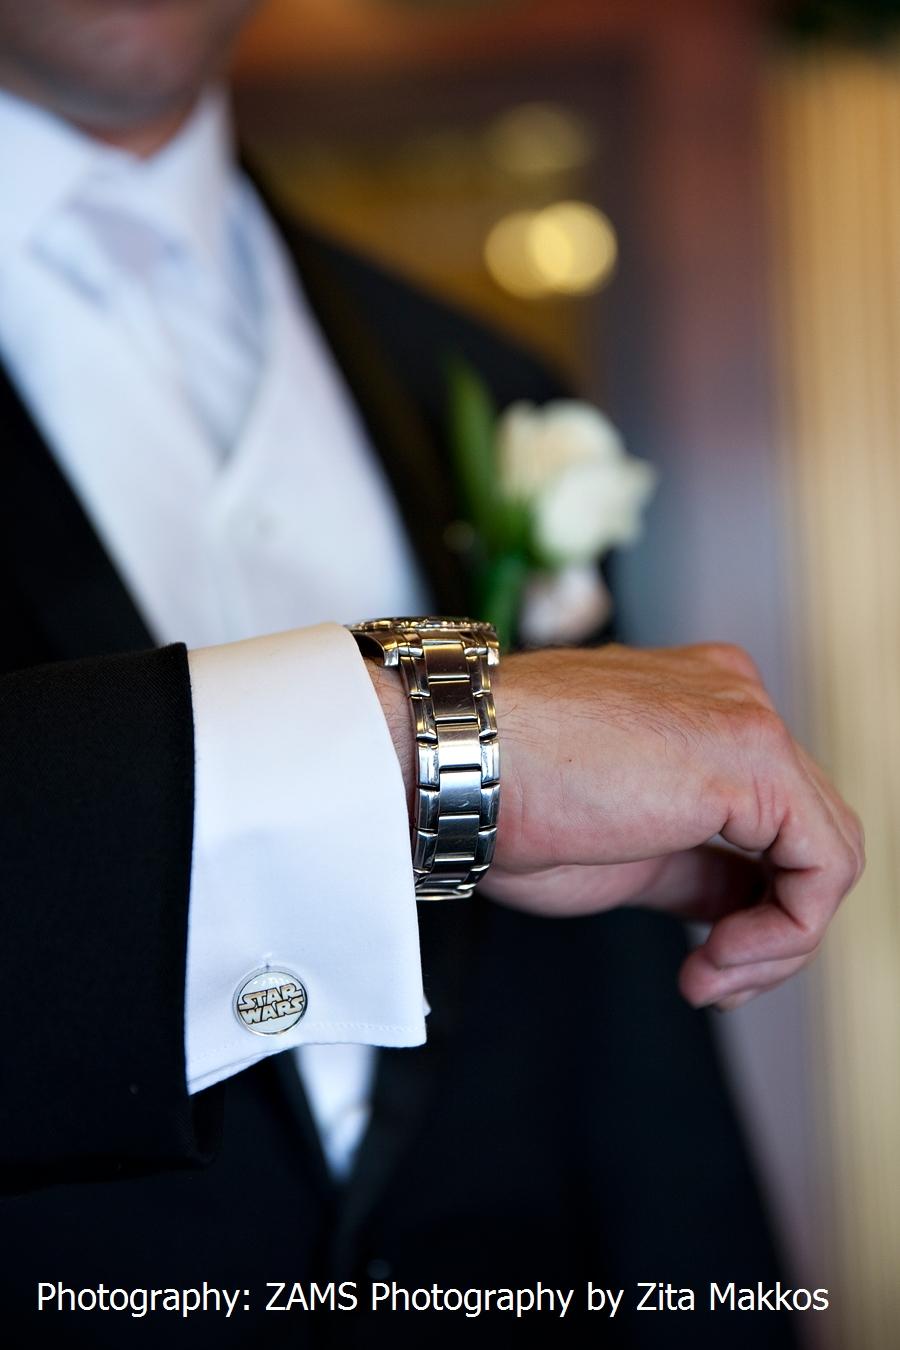 5_finger_death_punch_logo_cuff_links_men_wedding_cufflinks_2.jpg